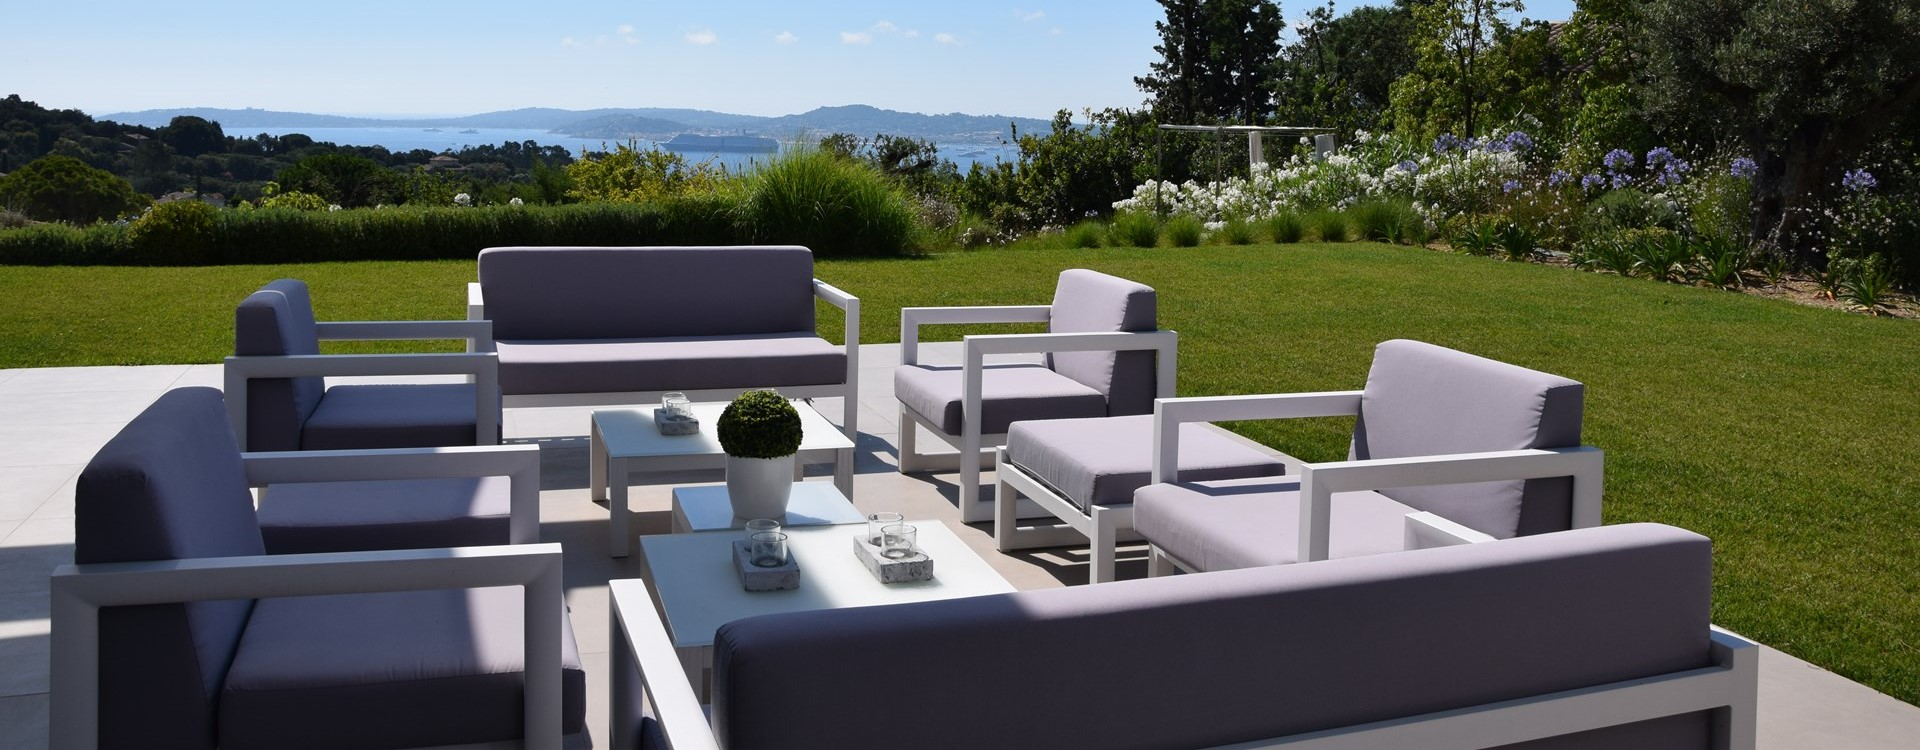 luxury-villa-holiday-cote-d-azur